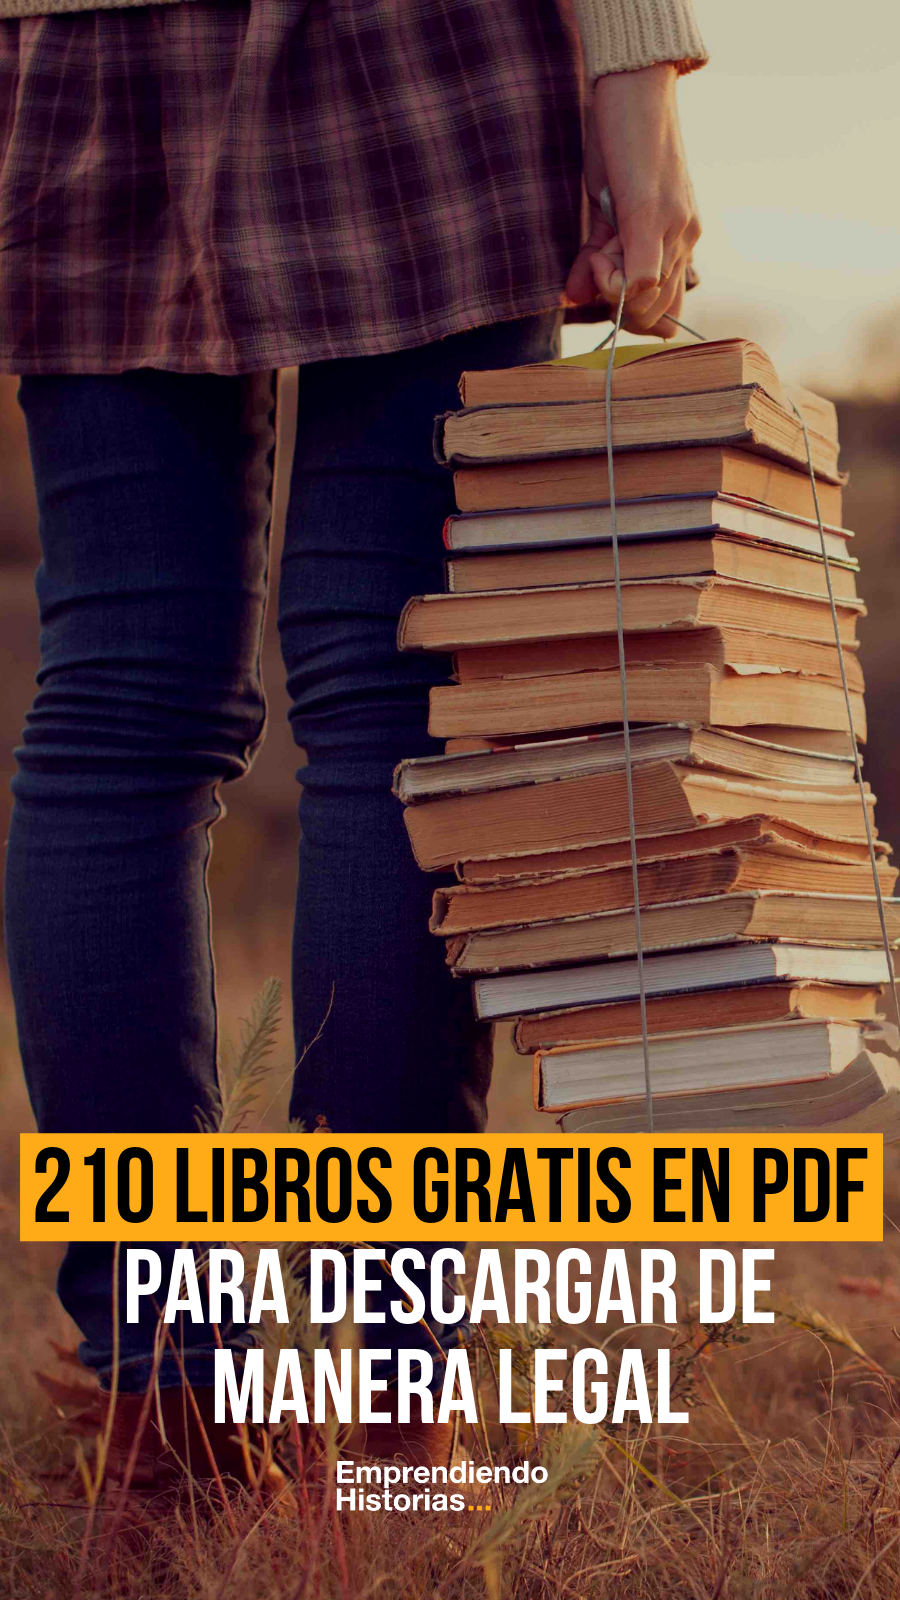 210 Libros Gratis En Pdf Para Descargar De Manera Legal Libros De Motivación Paginas Para Leer Libros Libros De Lectura Gratis